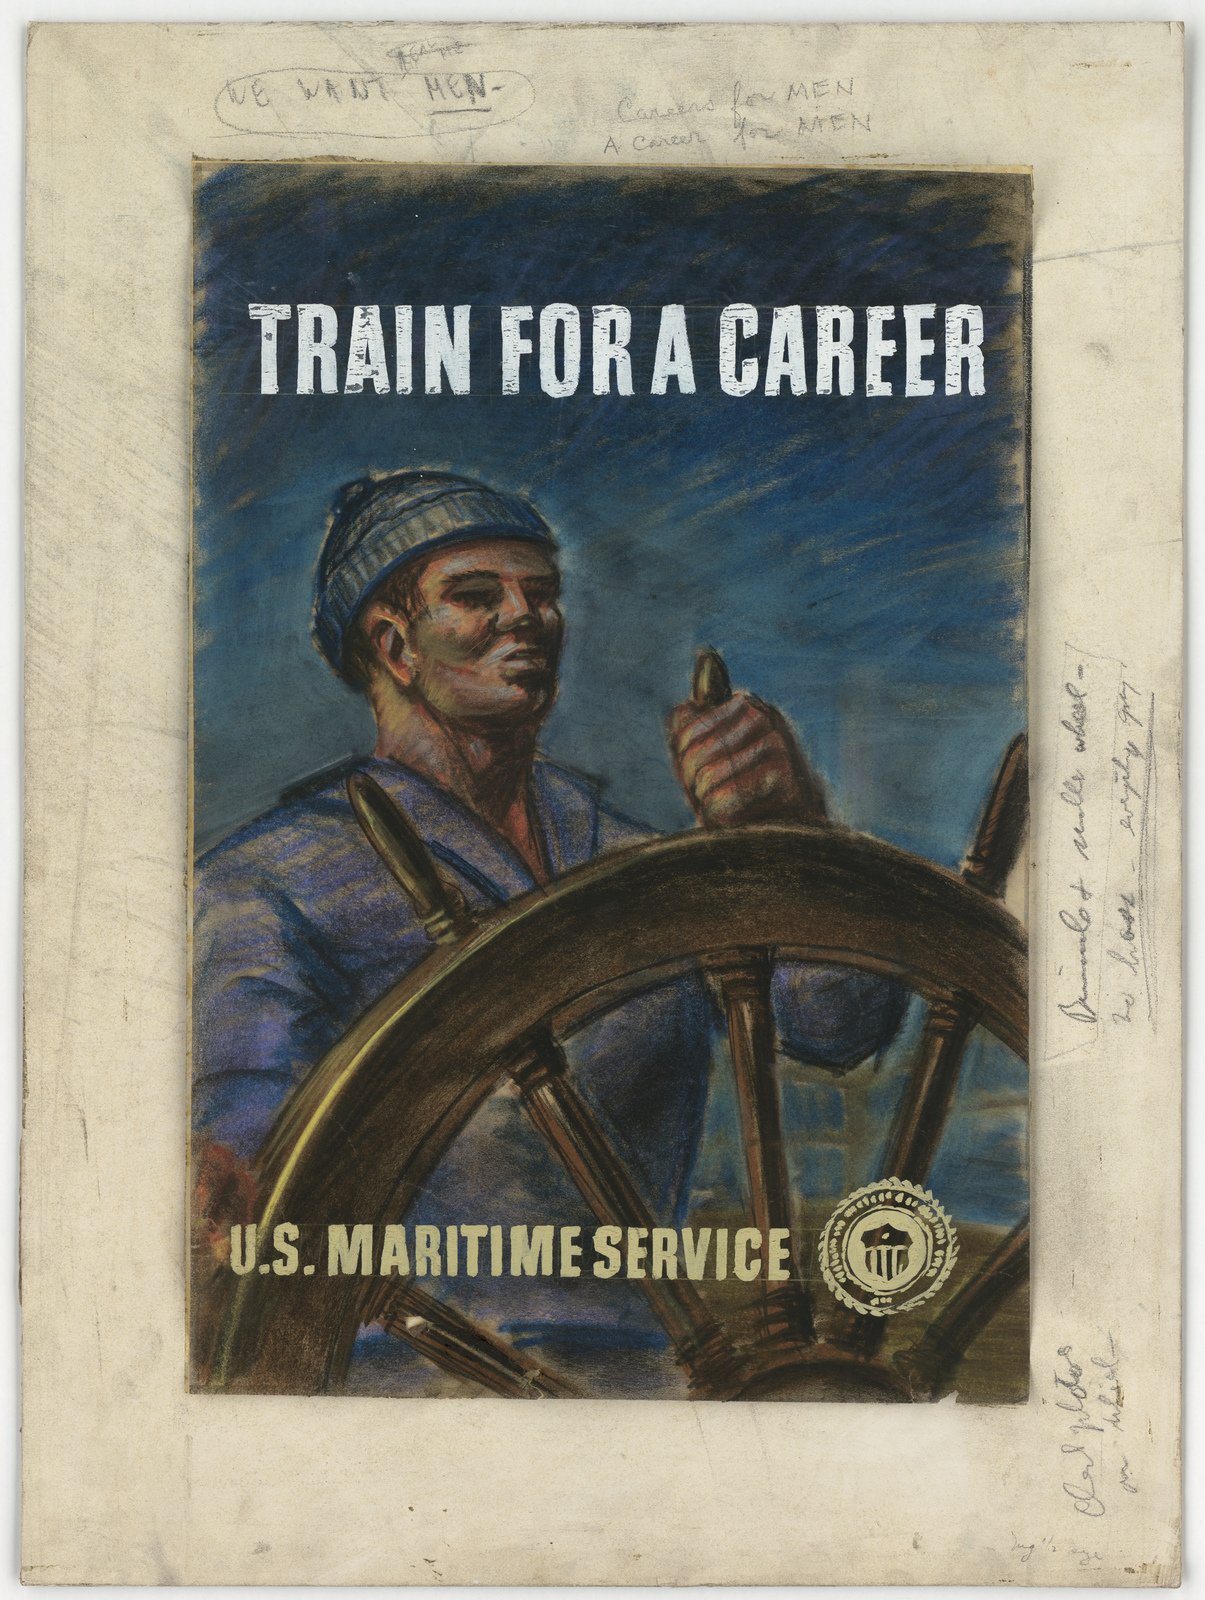 Train For A Career.  U.S. Maritime Service